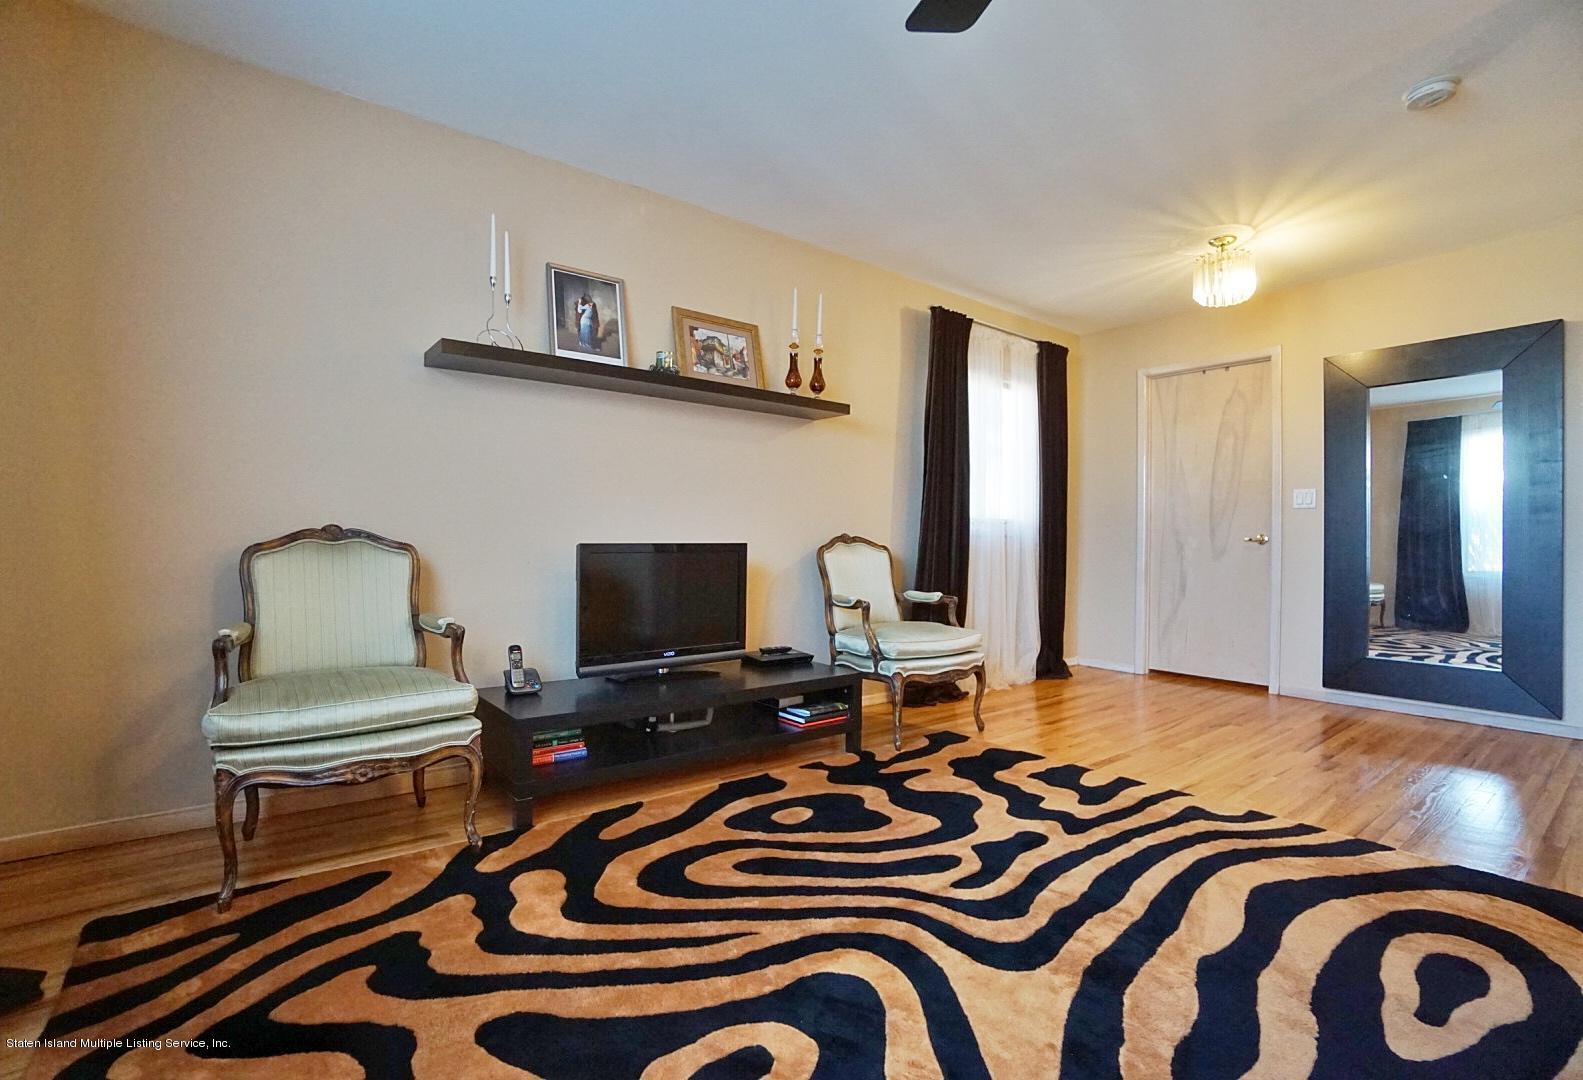 Single Family - Detached 183 Kensington Avenue  Staten Island, NY 10305, MLS-1127107-21